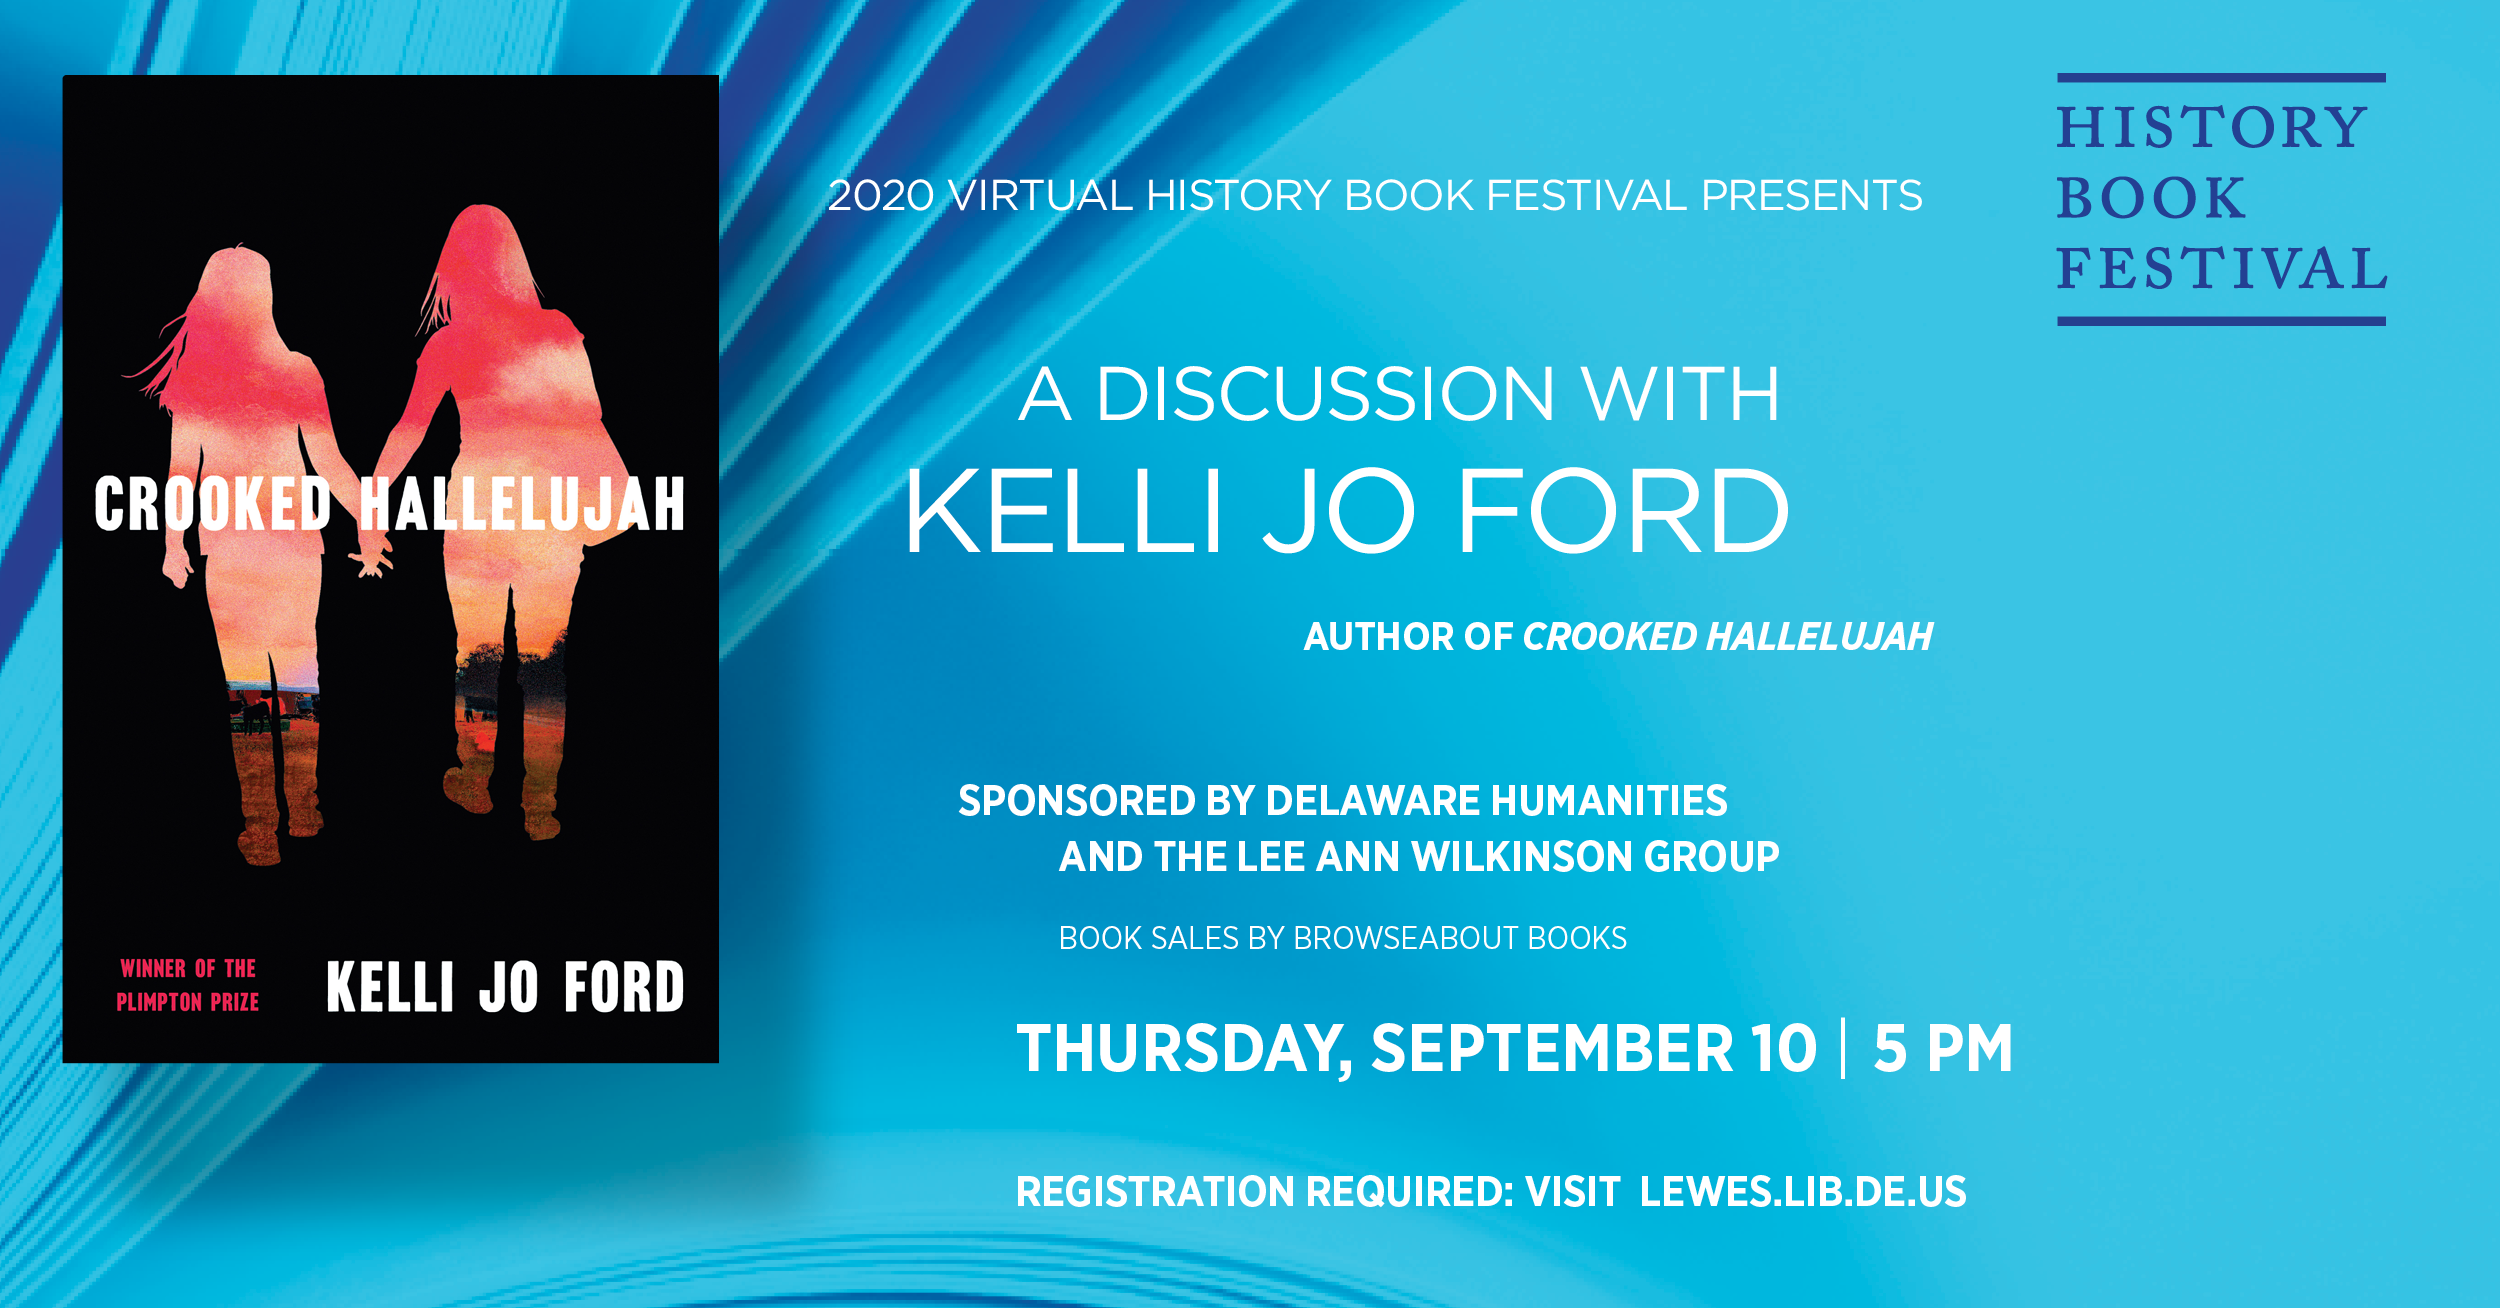 History Book Festival presents Kelli Jo Ford | Crooked Hallelujah